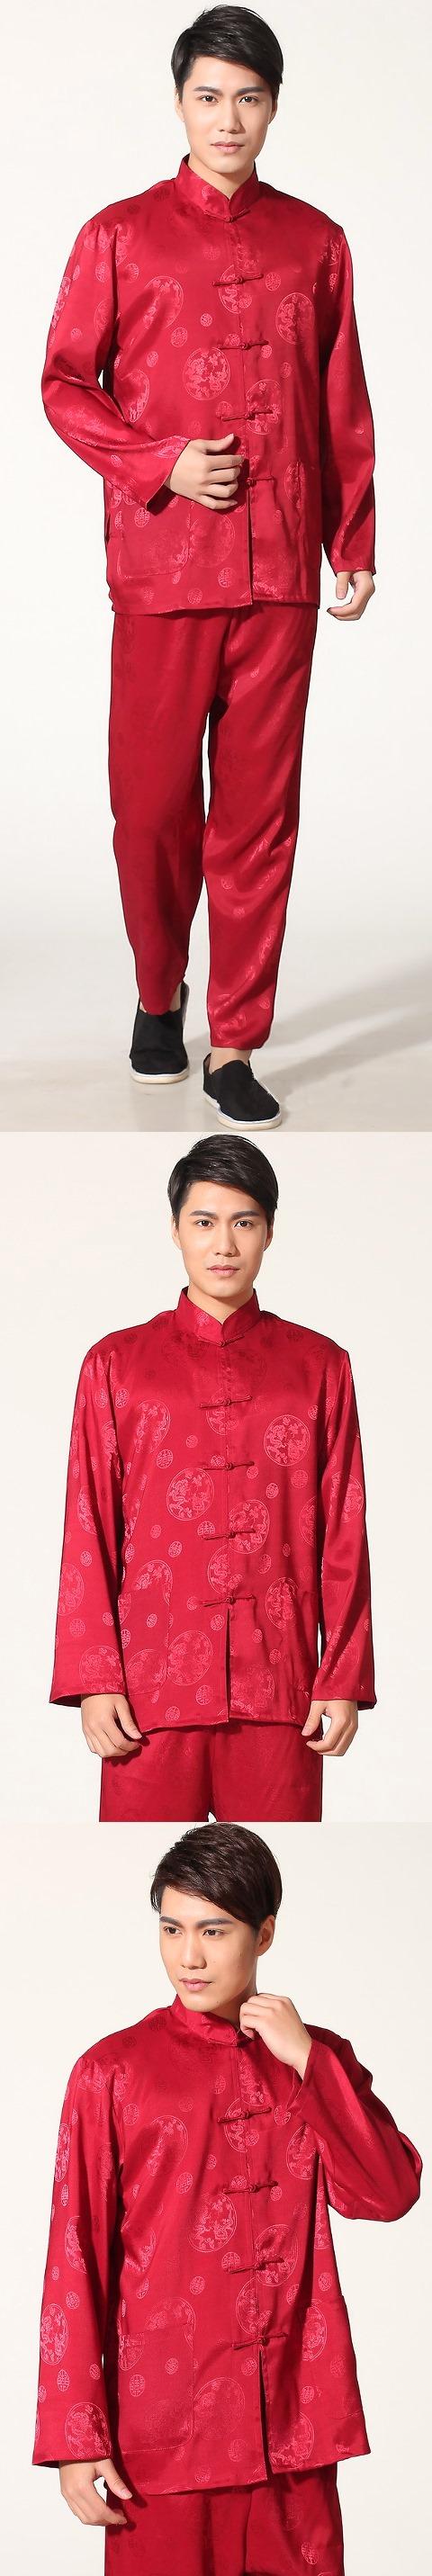 Dragon Embroidery Mandarin Jacquard Suit (RM)